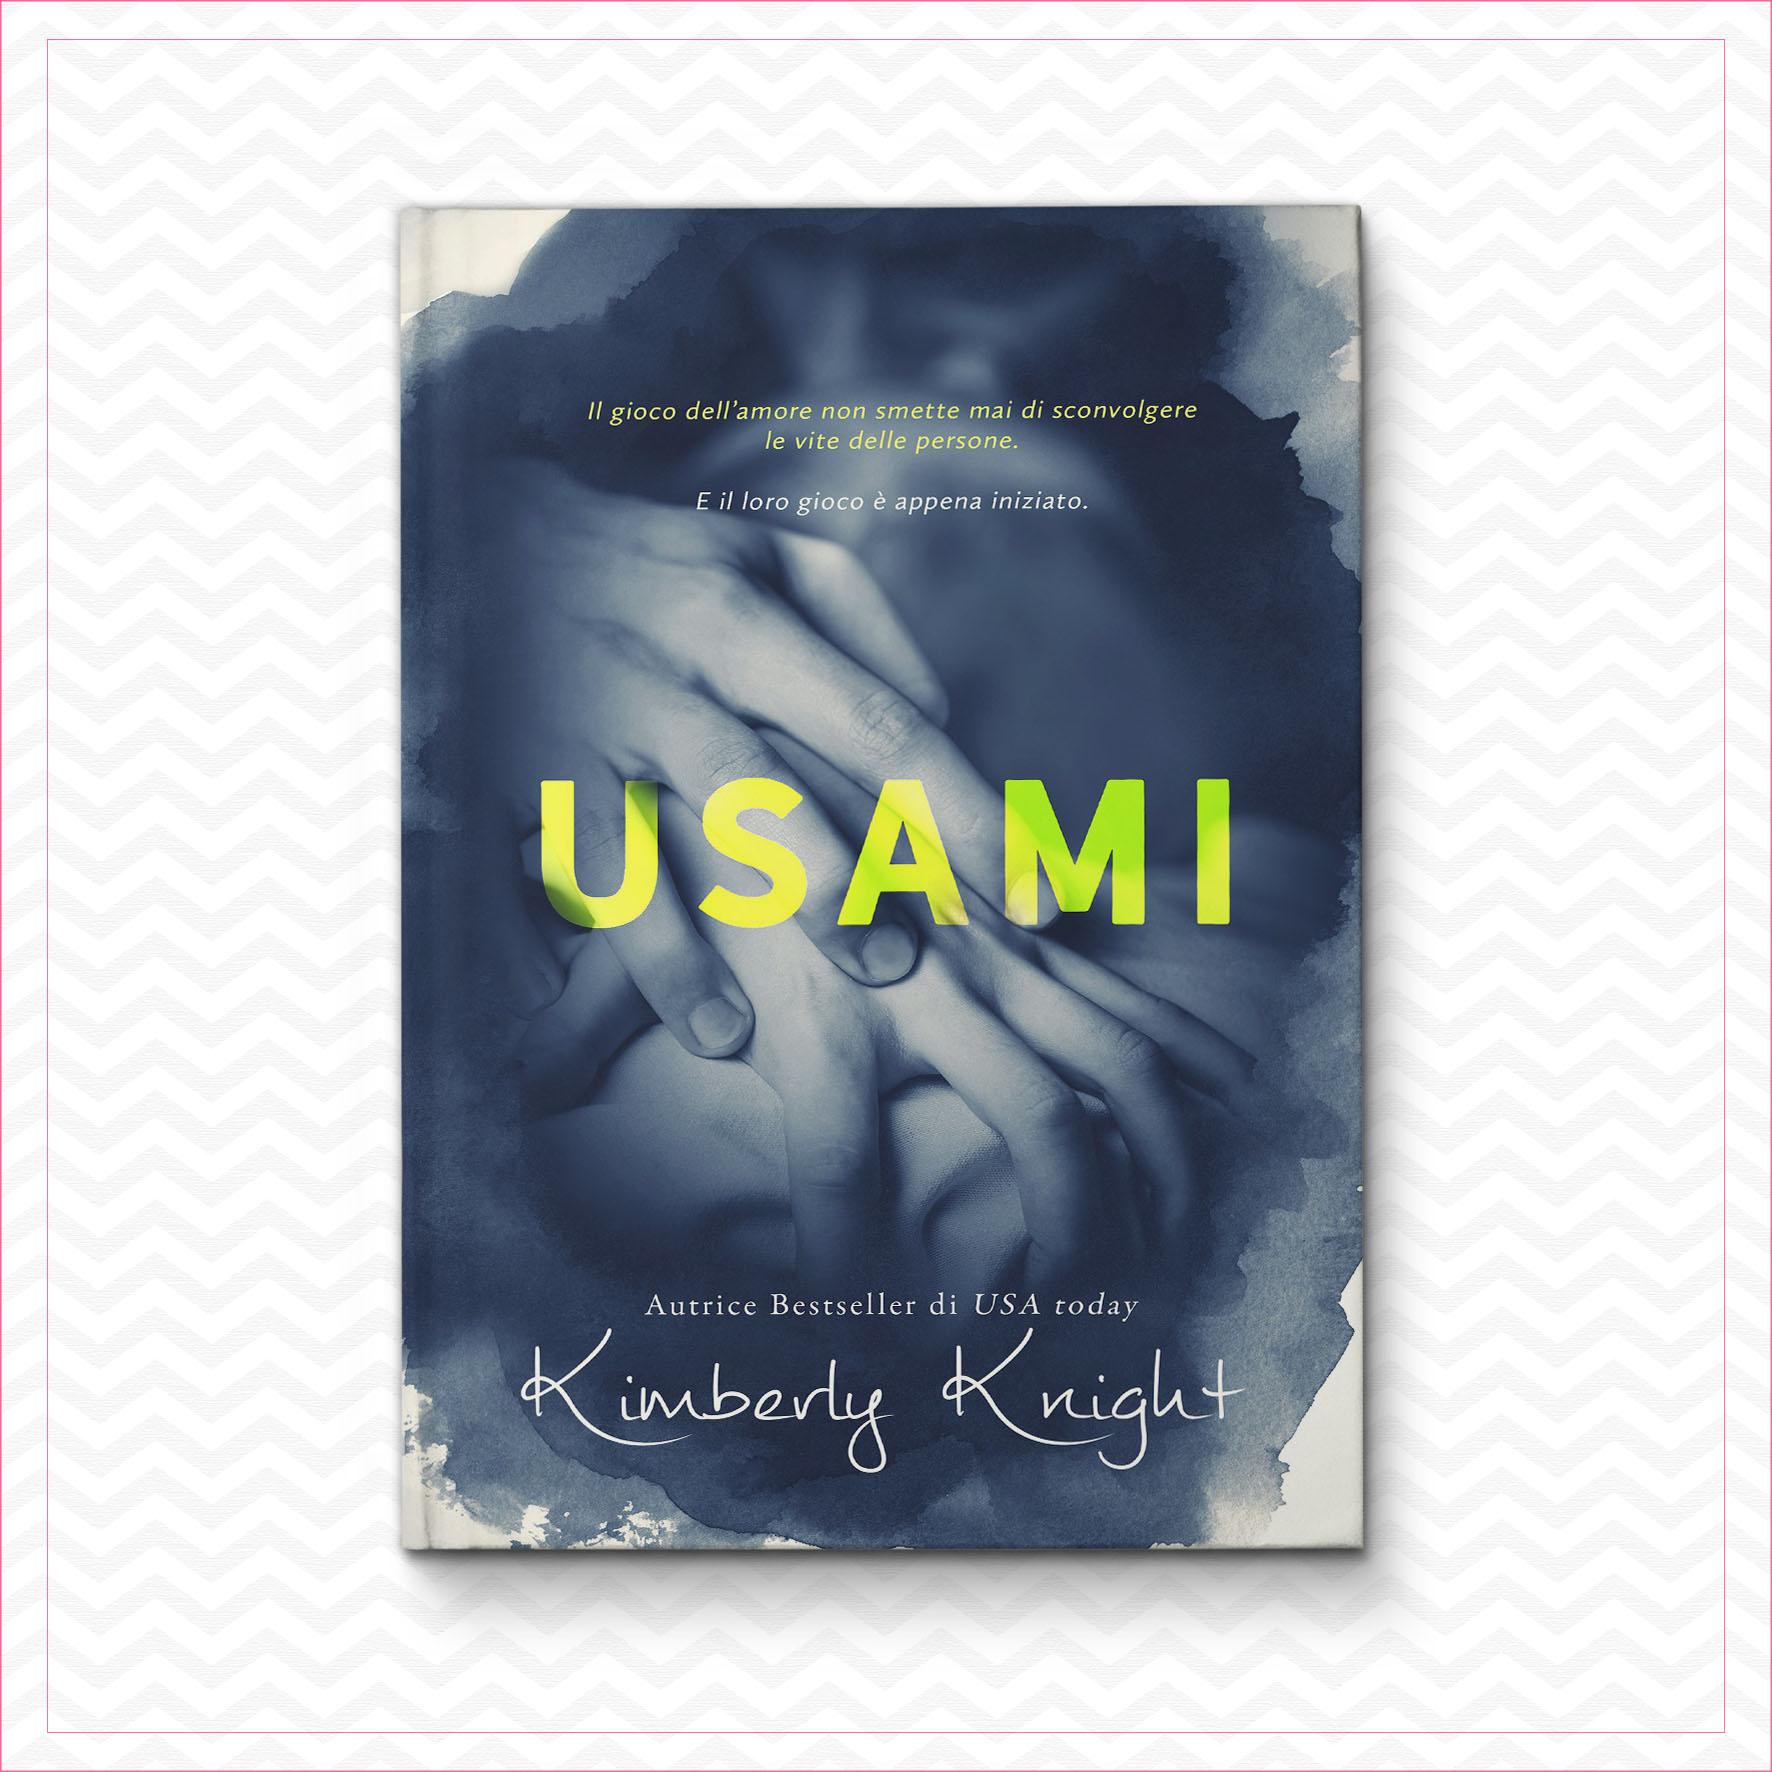 USAMI – Kimberly Knight – Versão Italiana